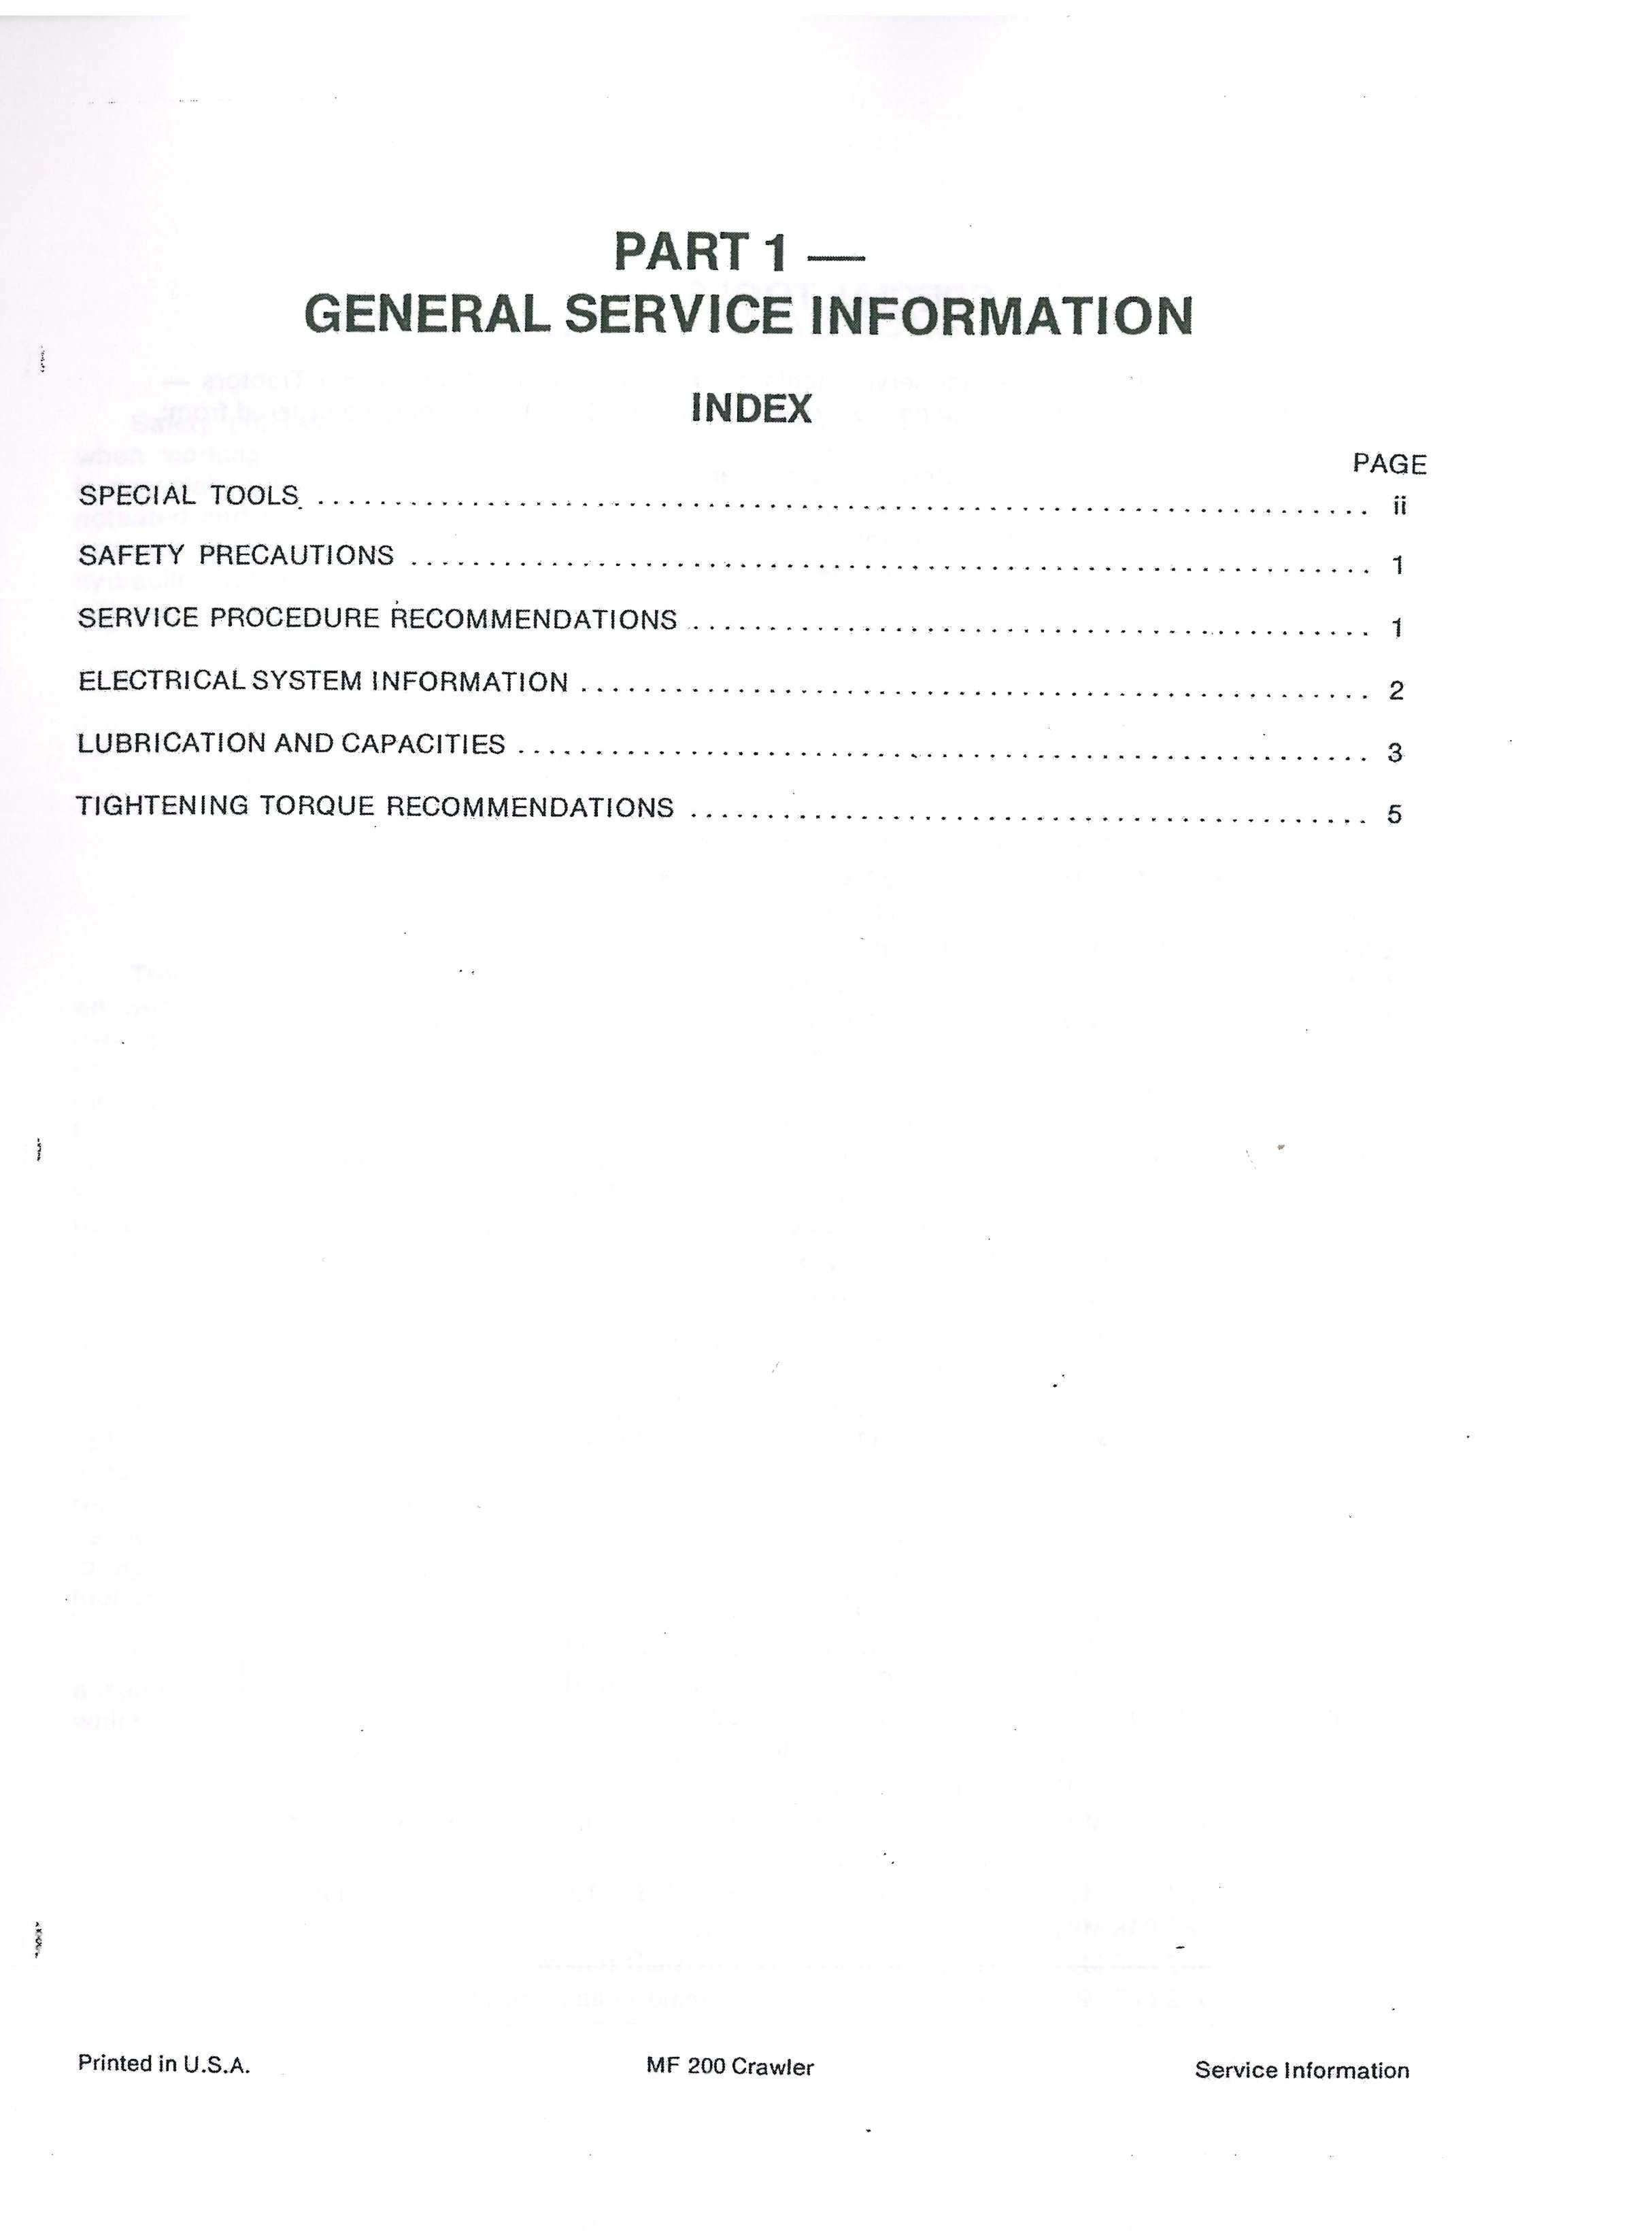 ... Massey-Ferguson-MF200-MF200B-Crawler-Service-Manual_002.jpg ...